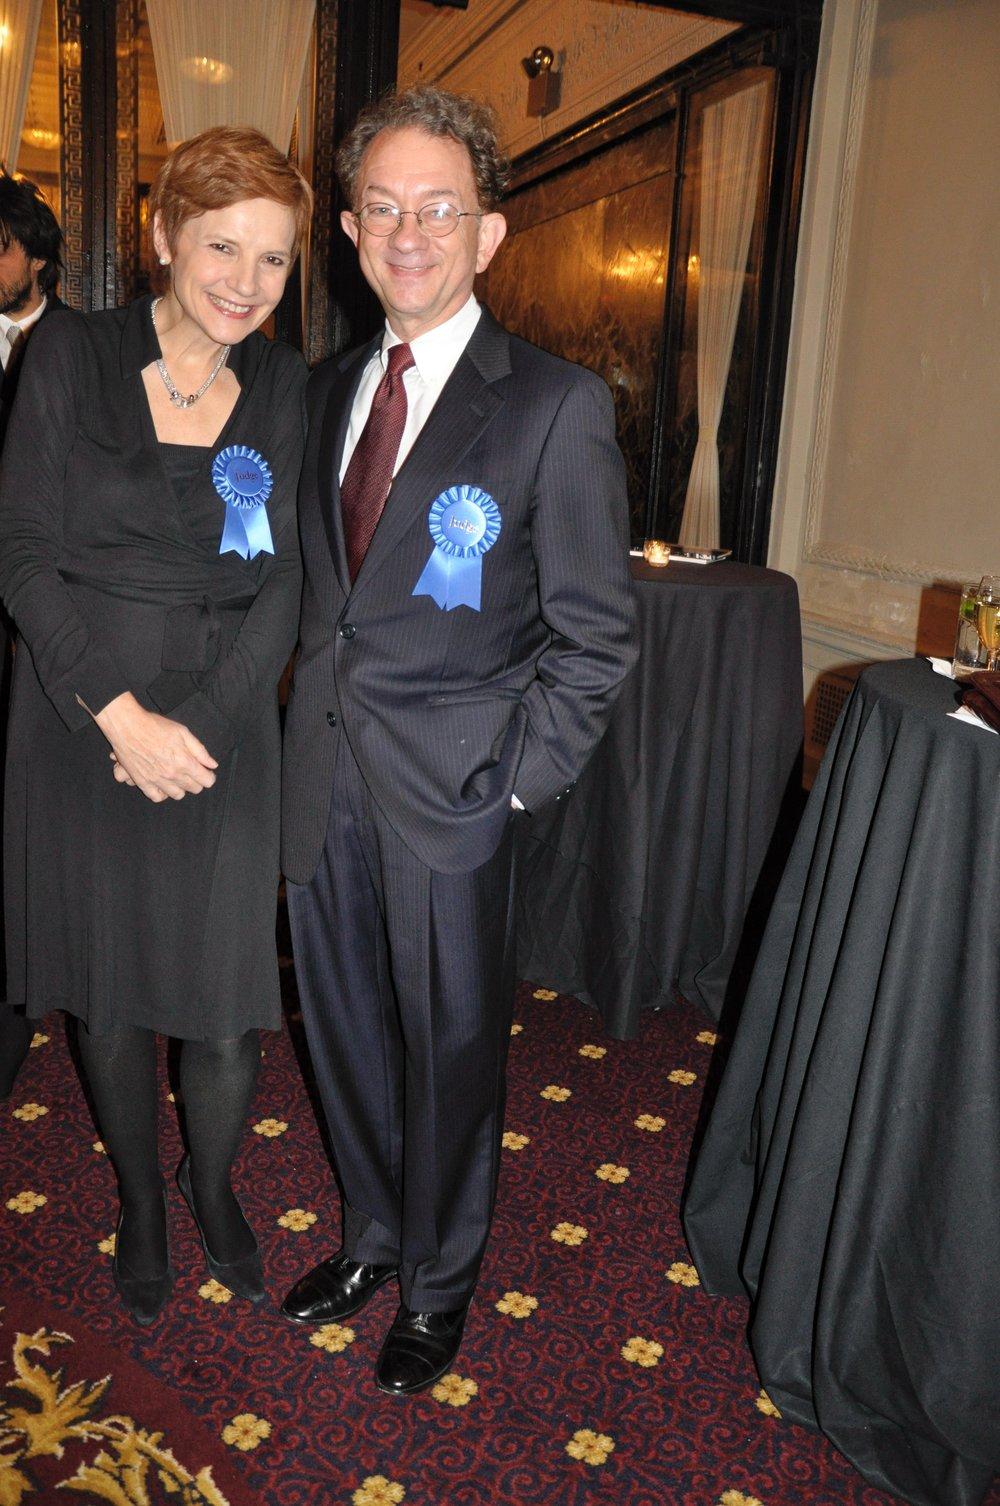 Tara Rubin and William Ivey Long